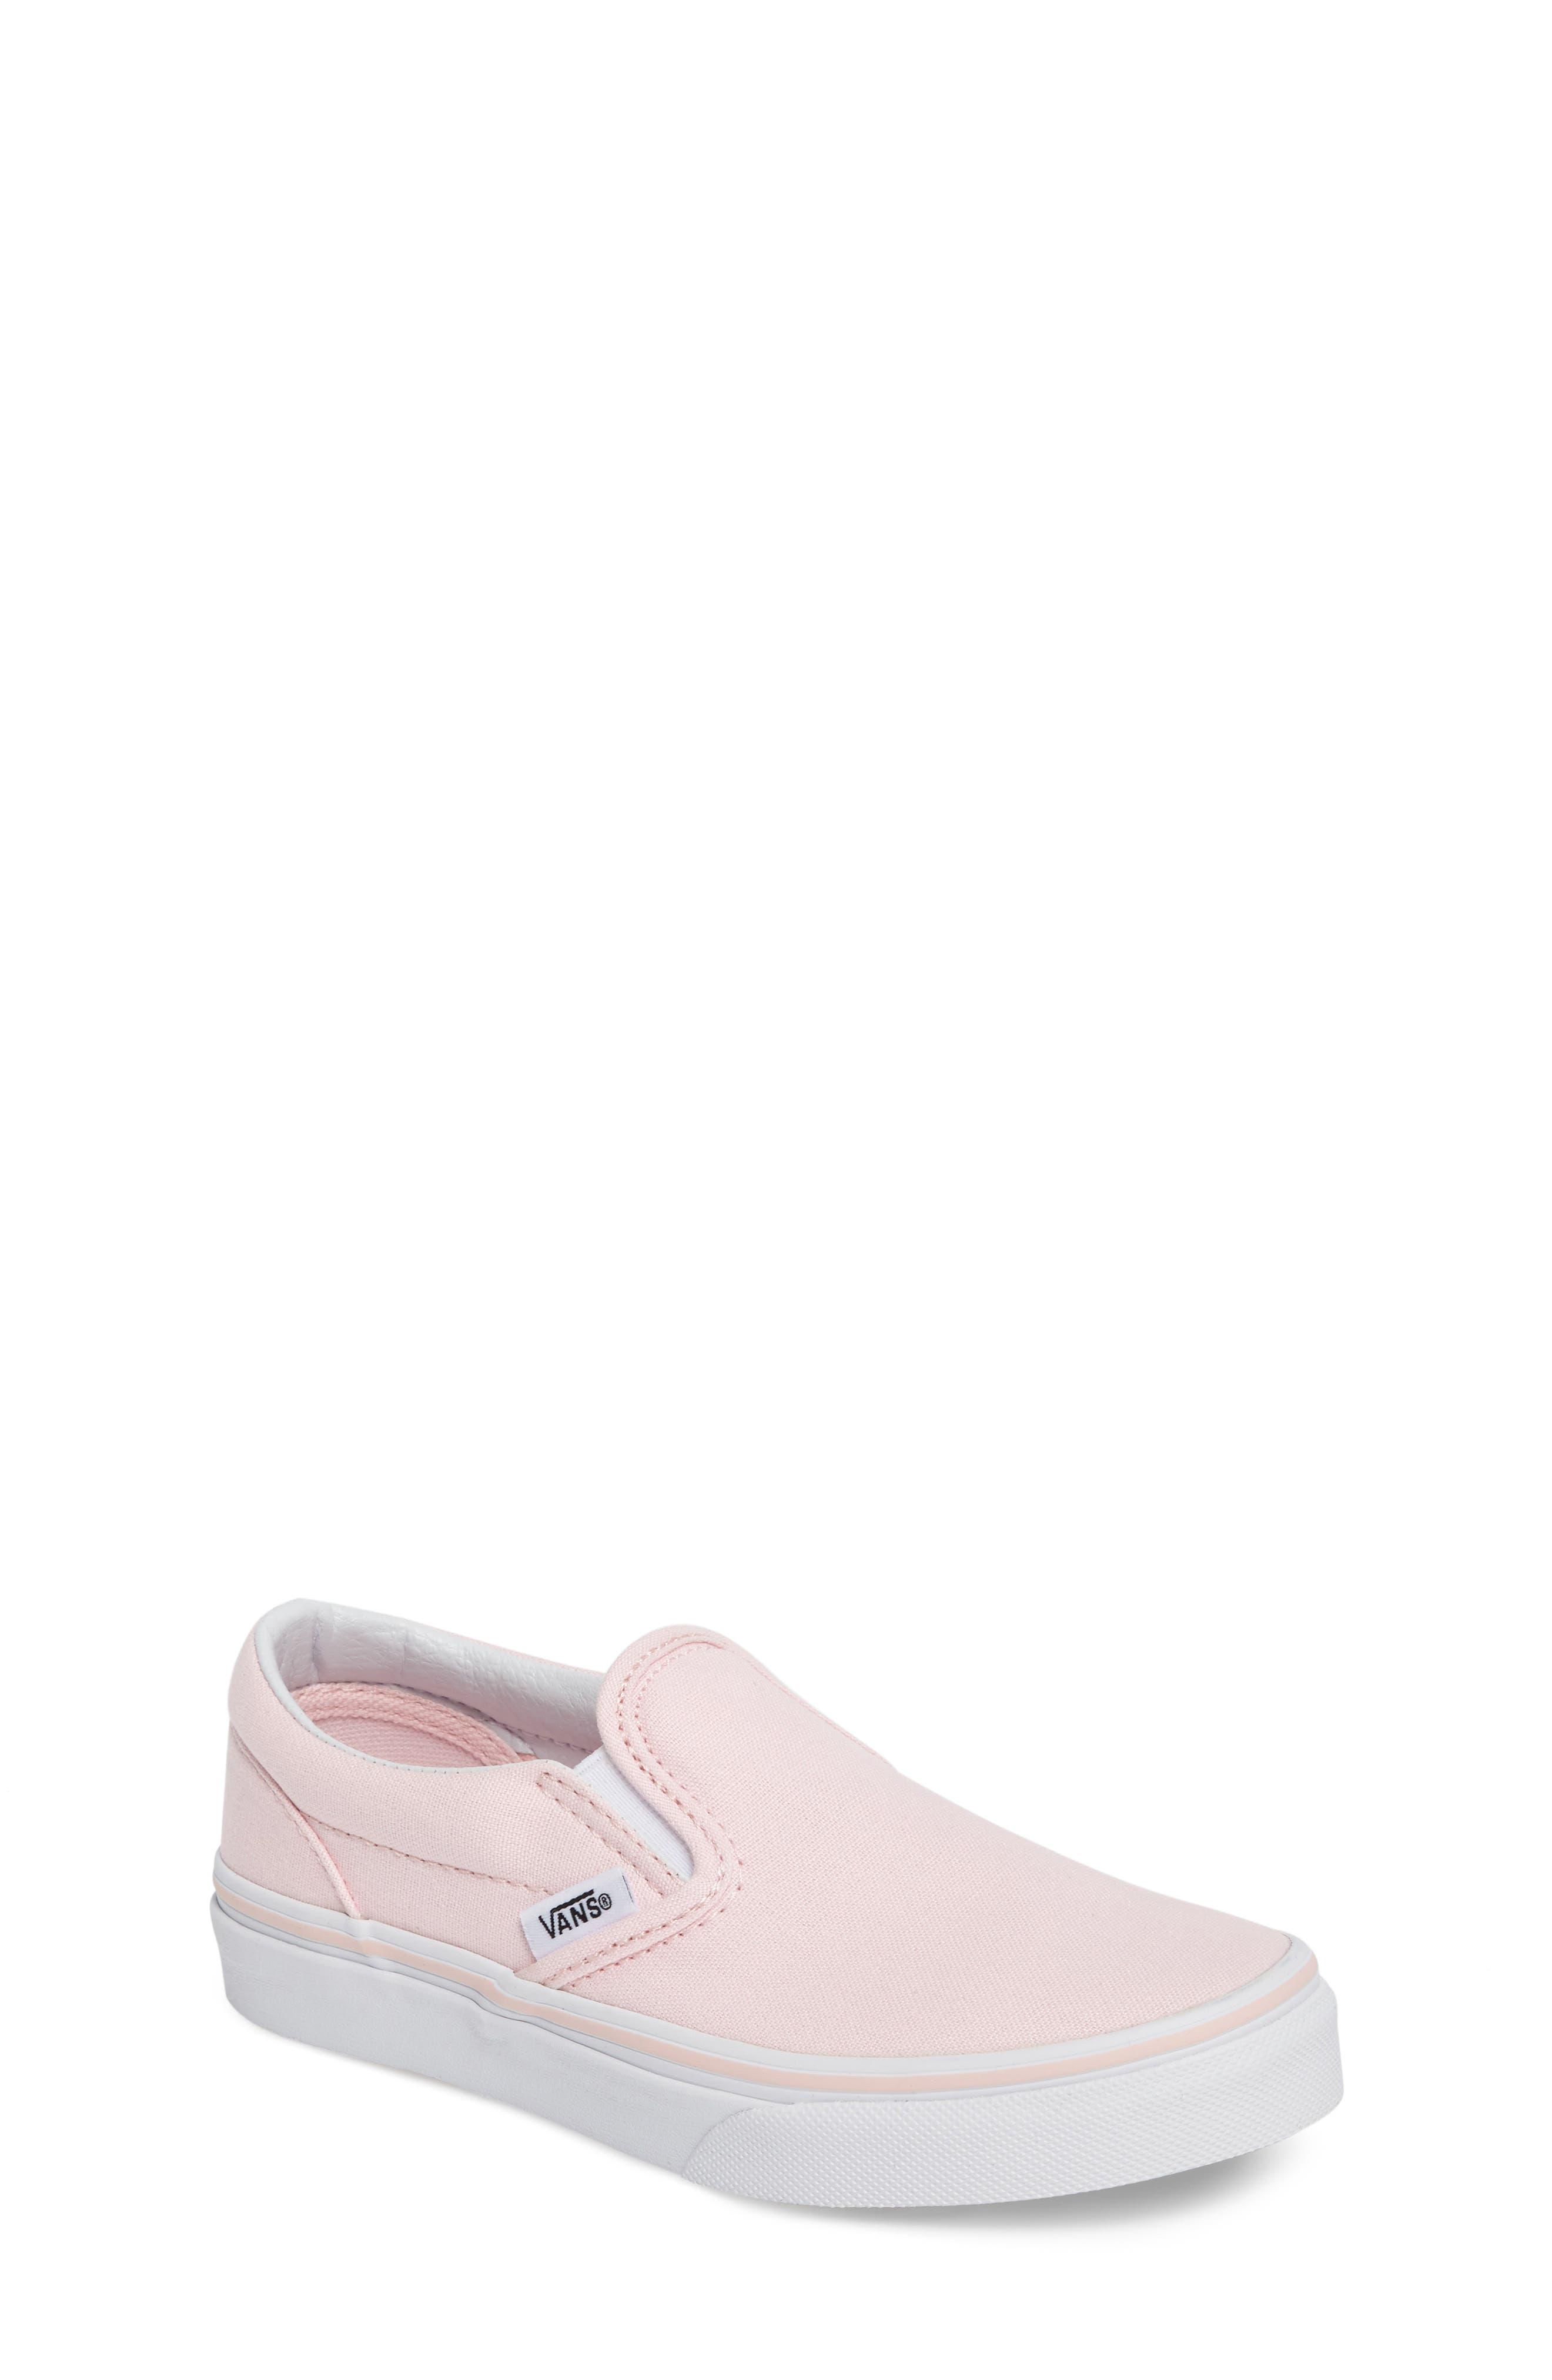 Alternate Image 1 Selected - Vans Classic Slip-On Sneaker (Baby, Walker, Toddler, Little Kid & Big Kid)